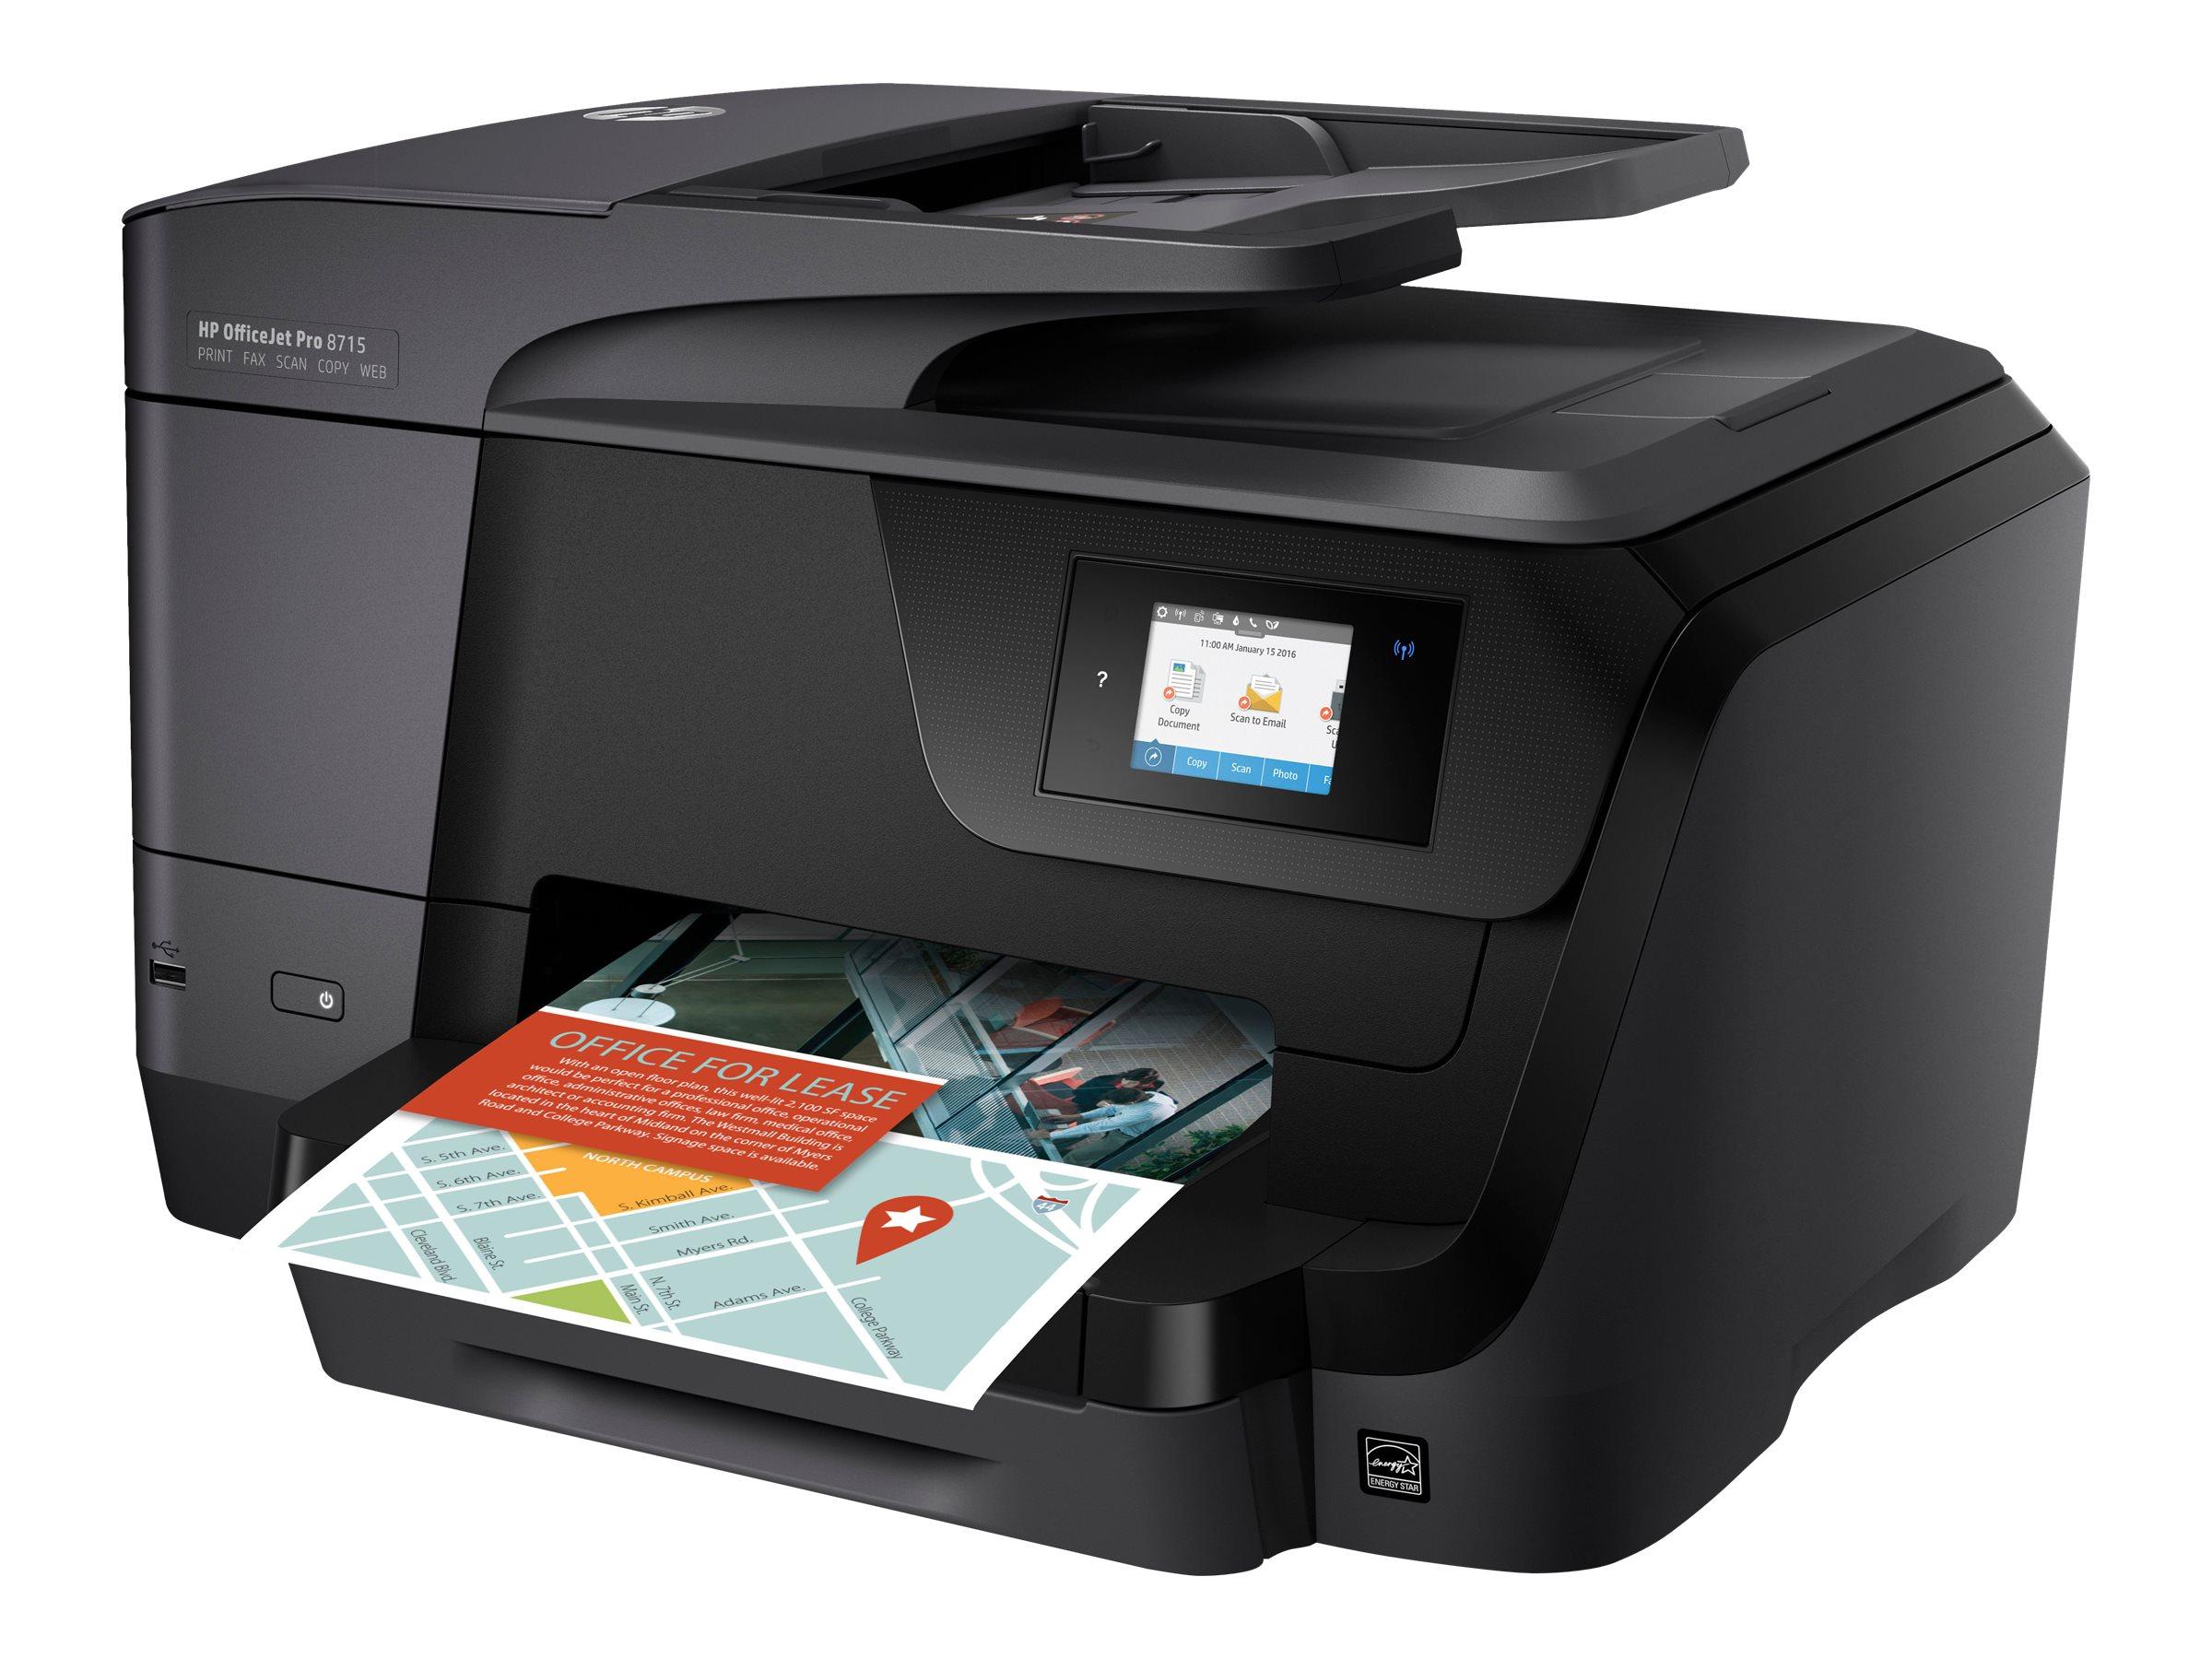 HP Officejet Pro 8715 All-in-One - Multifunktionsdrucker - Farbe - Tintenstrahl - bis zu 35 Seiten/Min. (Drucken) - 250 Blatt - USB 2.0 - LAN - Wi-Fi